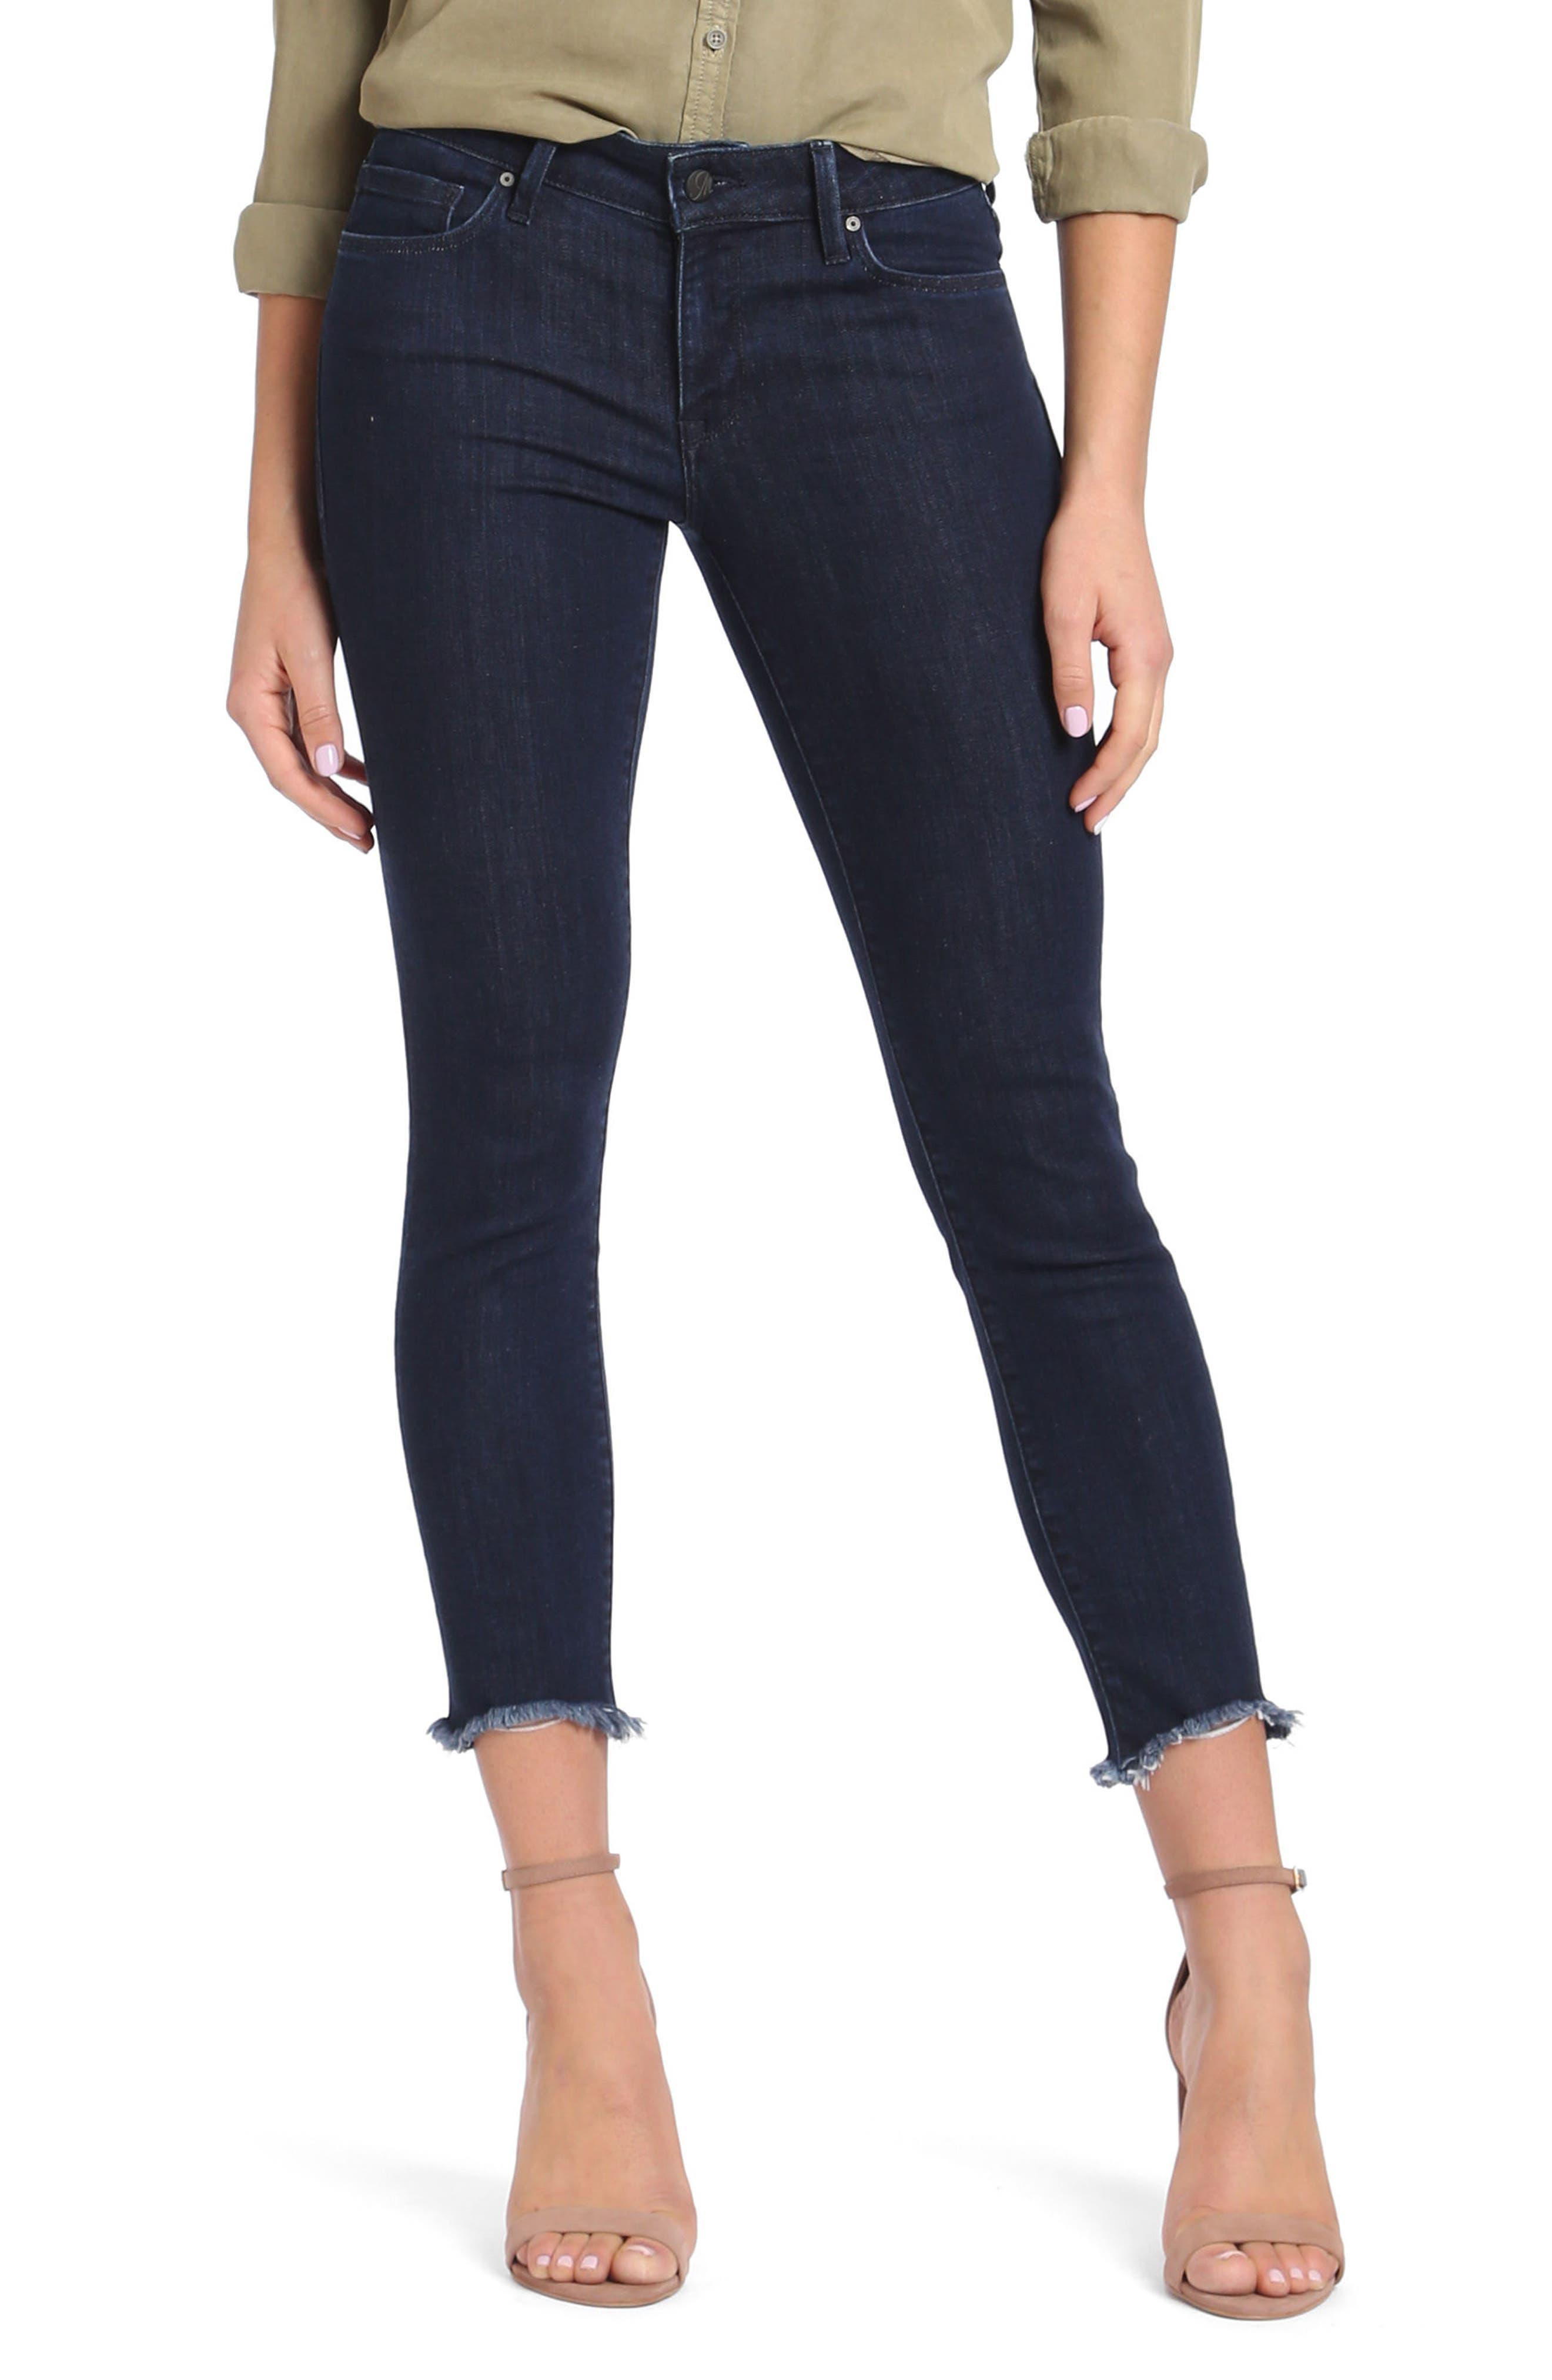 Alternate Image 1 Selected - Mavi Jeans Adriana Ankle Skinny Jeans (Rinse Tribeca)